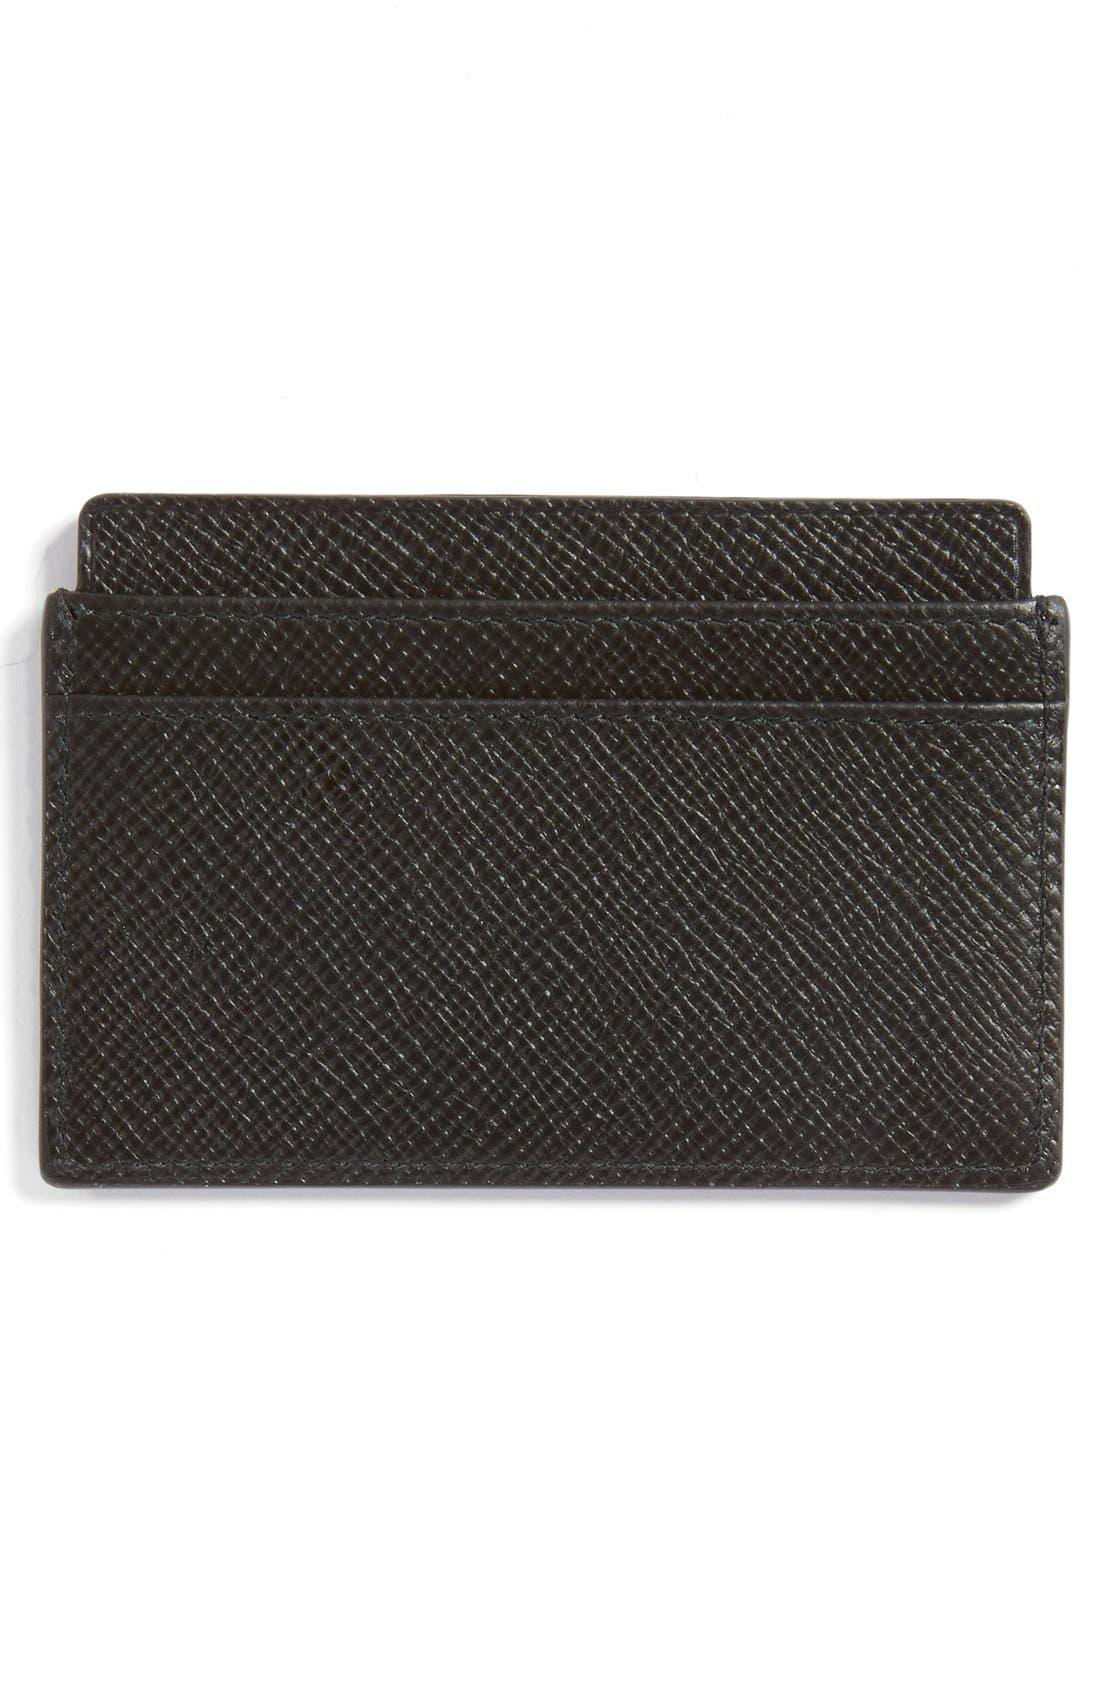 'Panama' Leather Card Case,                             Alternate thumbnail 2, color,                             001